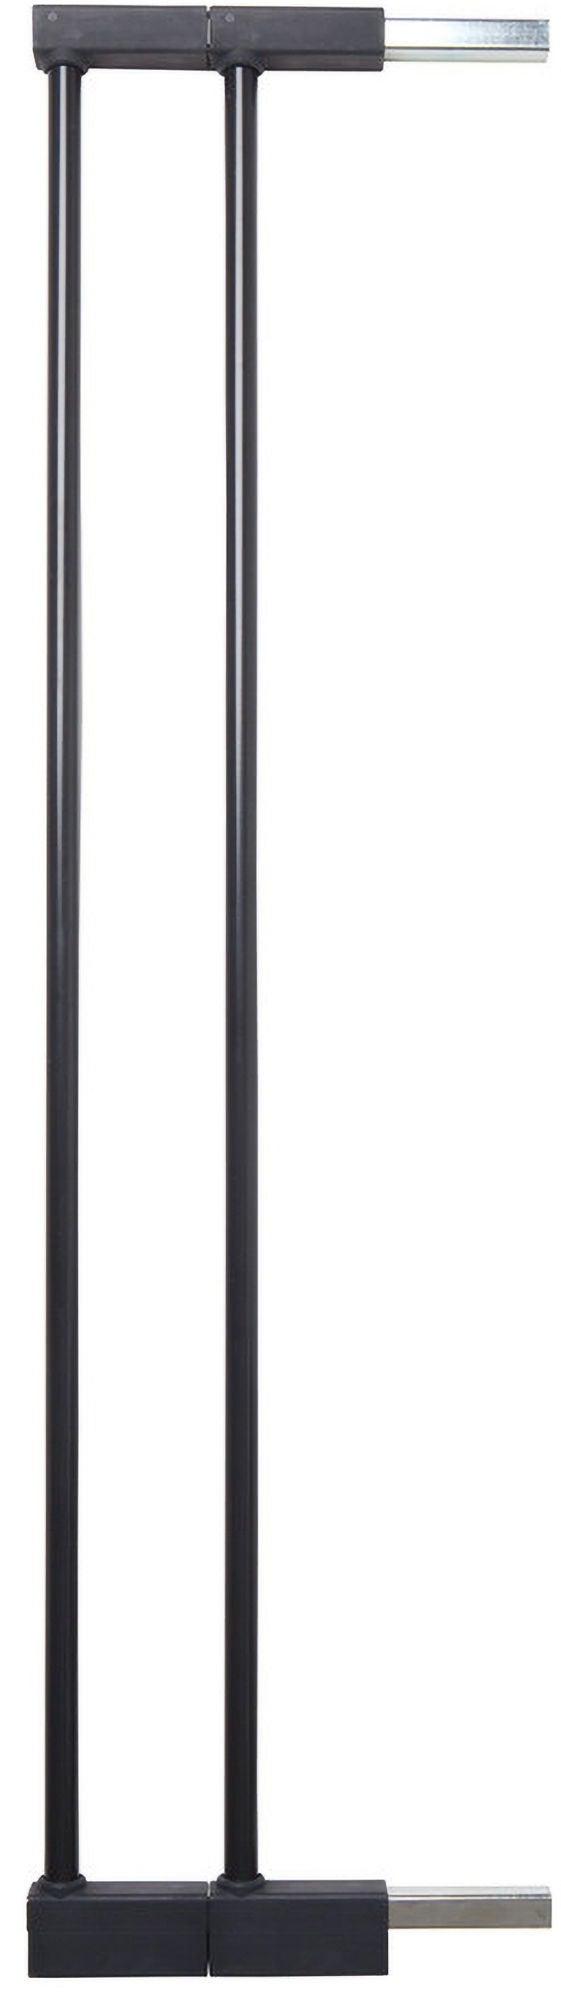 BabyDan Extend-A-Gate Turvaportin Jatkopalat 2 x 7cm, Musta